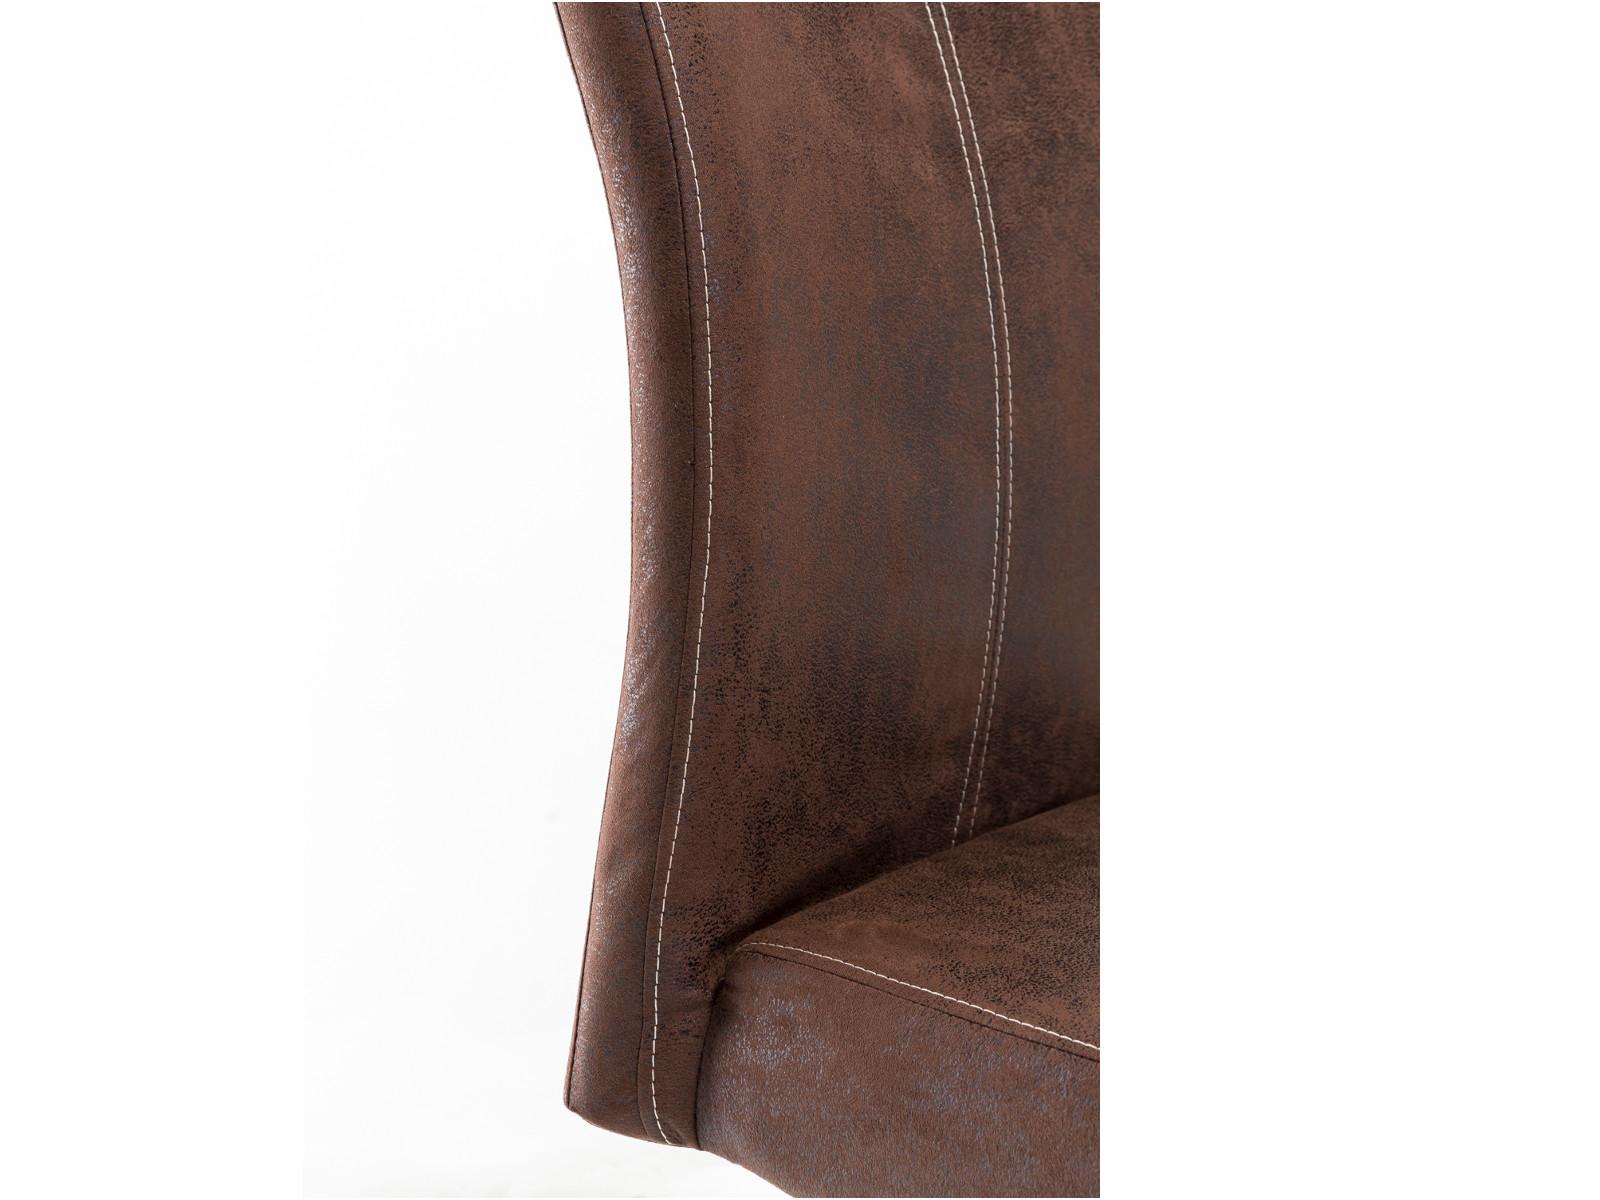 2x schwingstuhl riverton stoff braun freischwinger. Black Bedroom Furniture Sets. Home Design Ideas